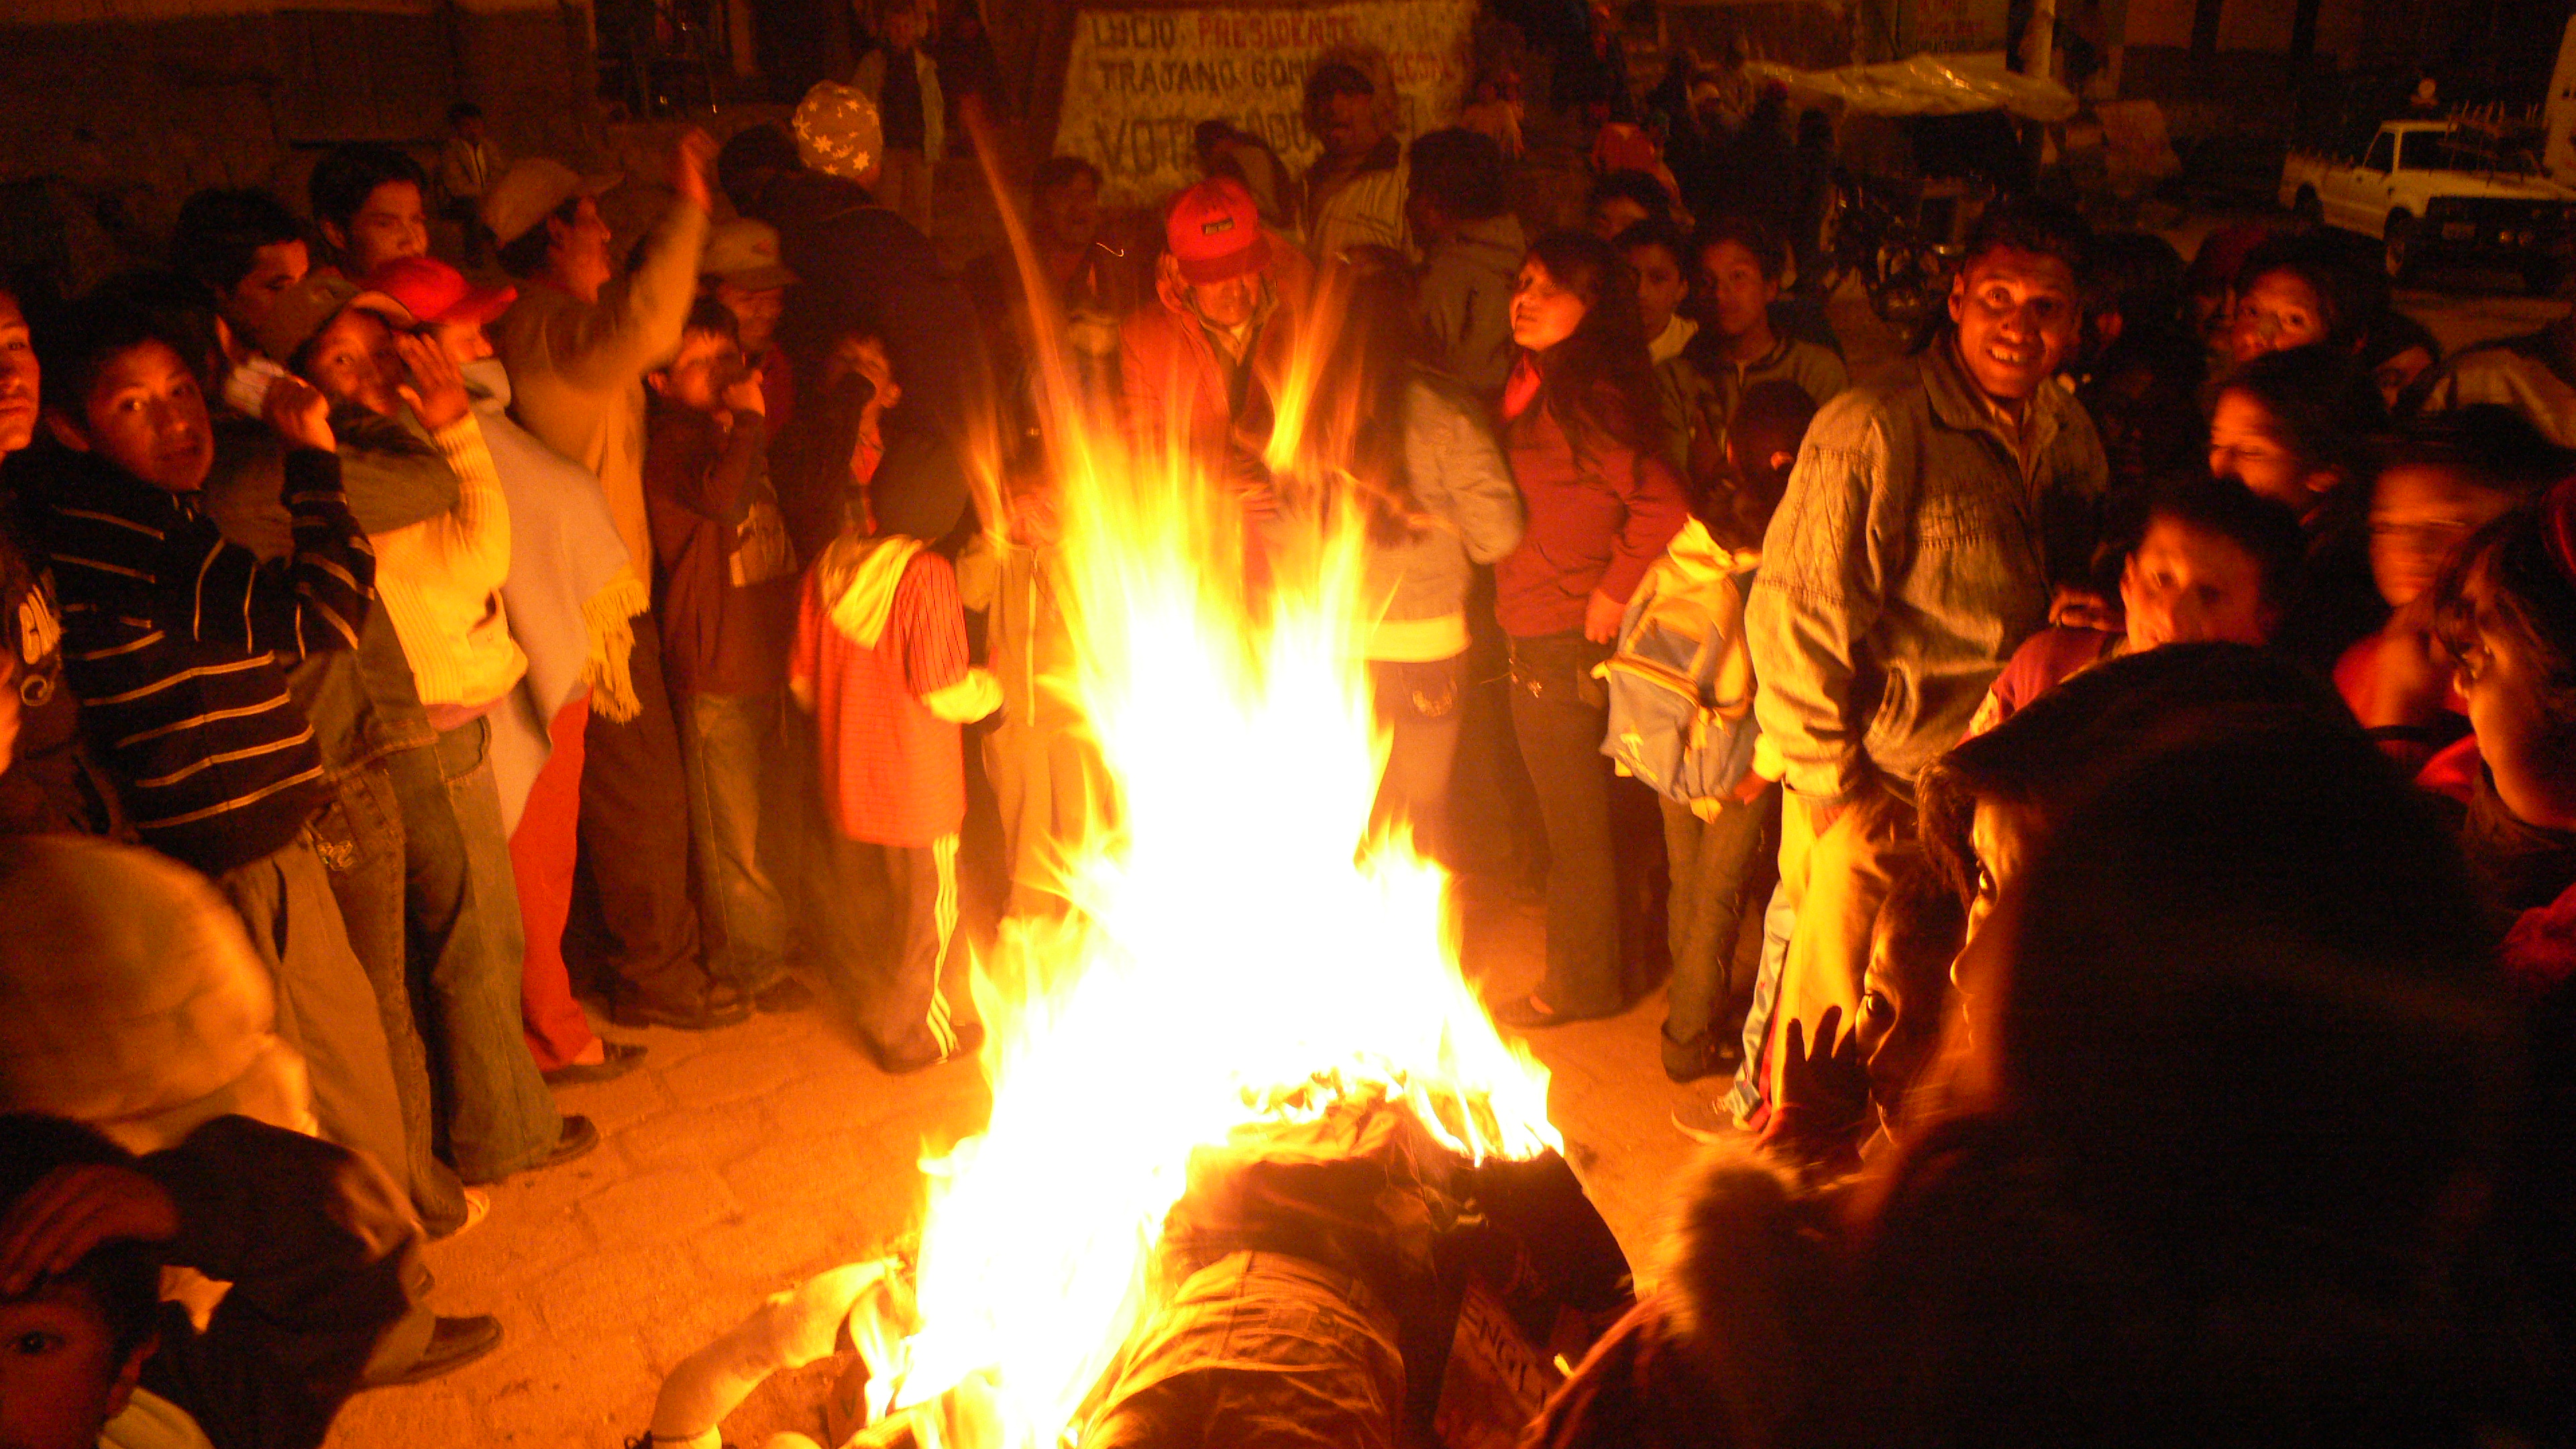 Ecuador: New Years Eve - 2009 - 2010